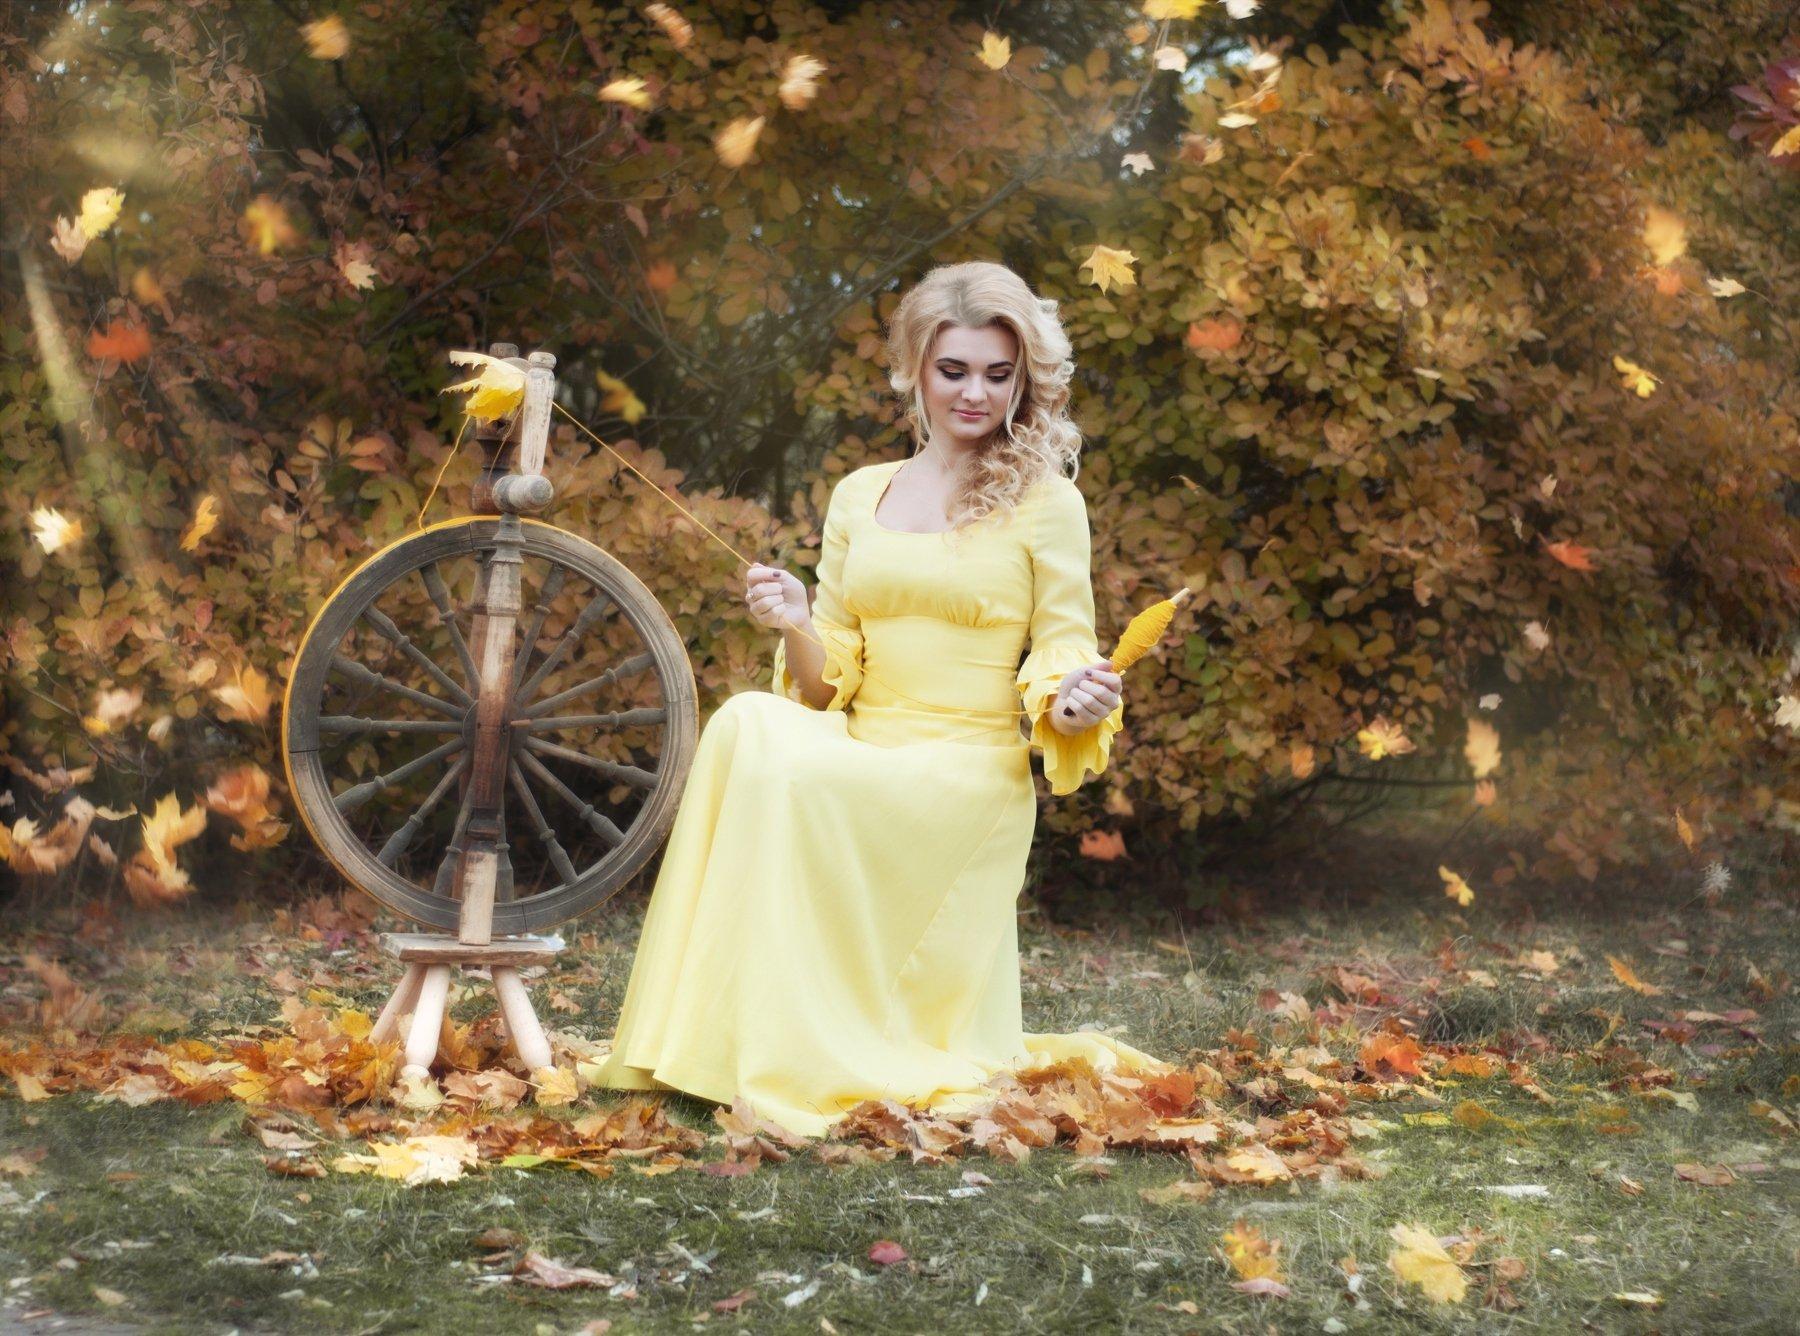 #art#artfoto#artwork#arts#greatphoto#portreitpage#photographer#mua#makeup#dress#style#beautiful#followme, Ленком Алёна